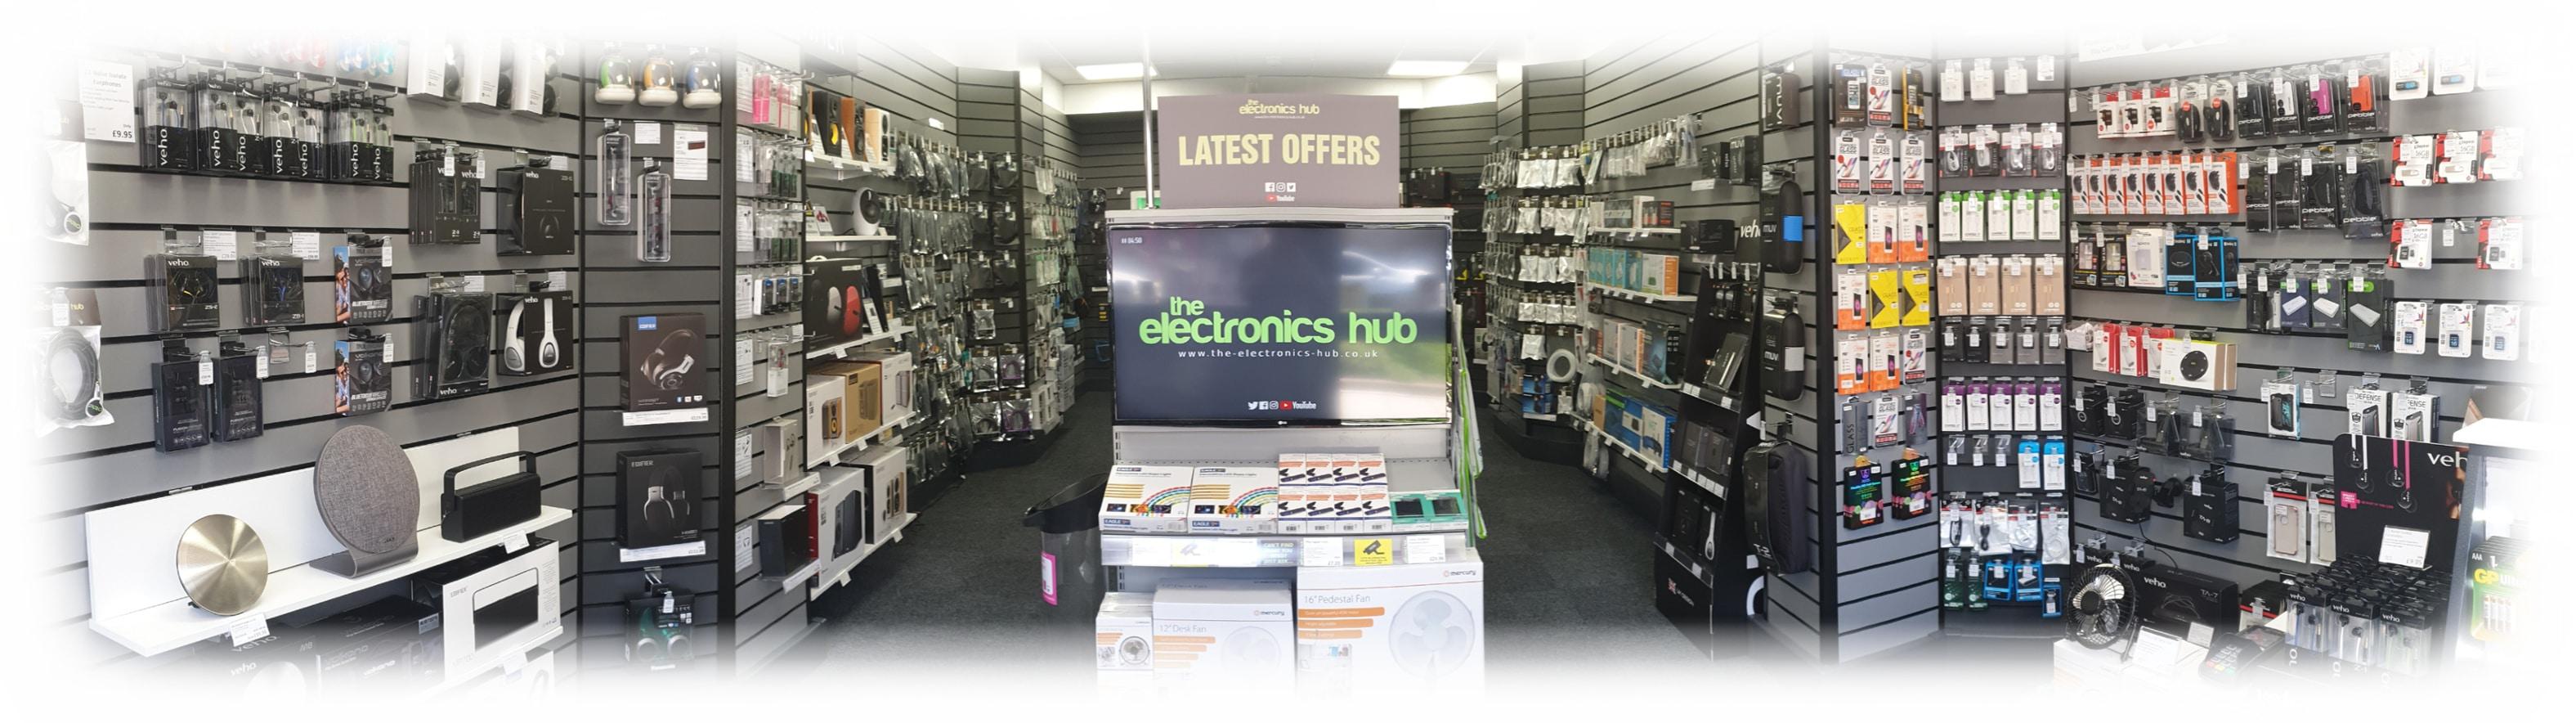 The Electronics Hub Panoramic